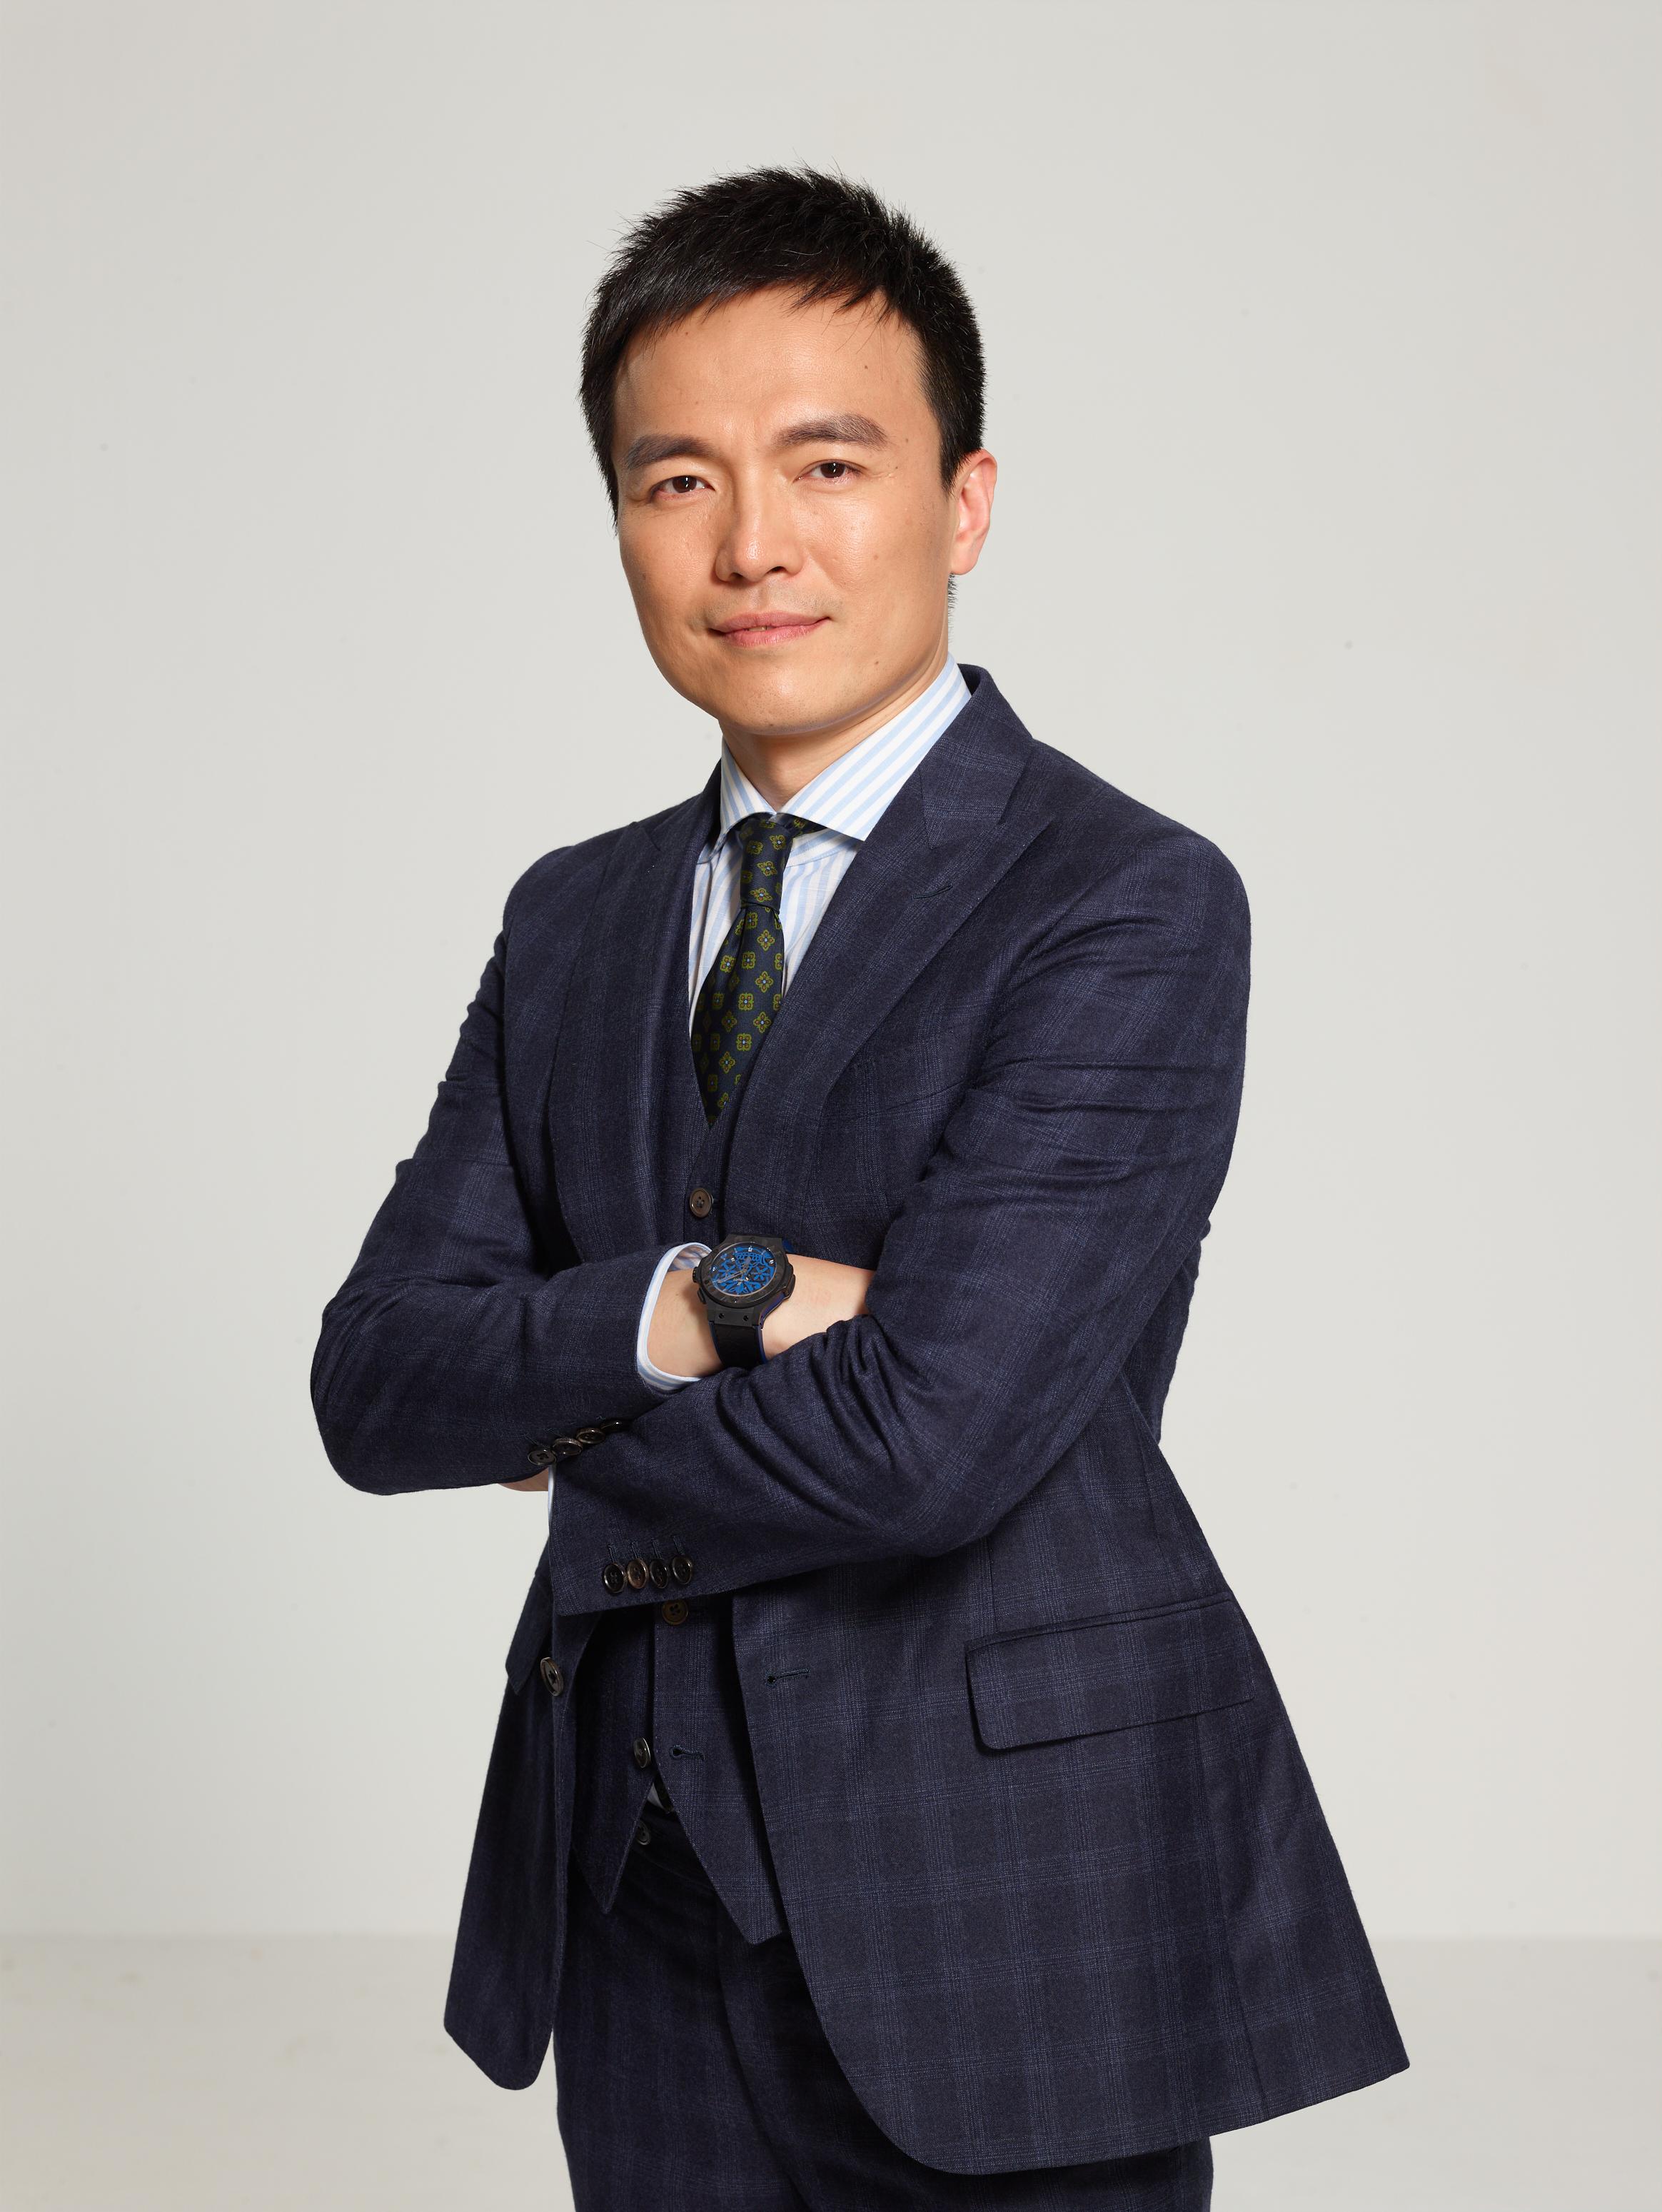 Derek Haoyang Li - Founder and Chairman